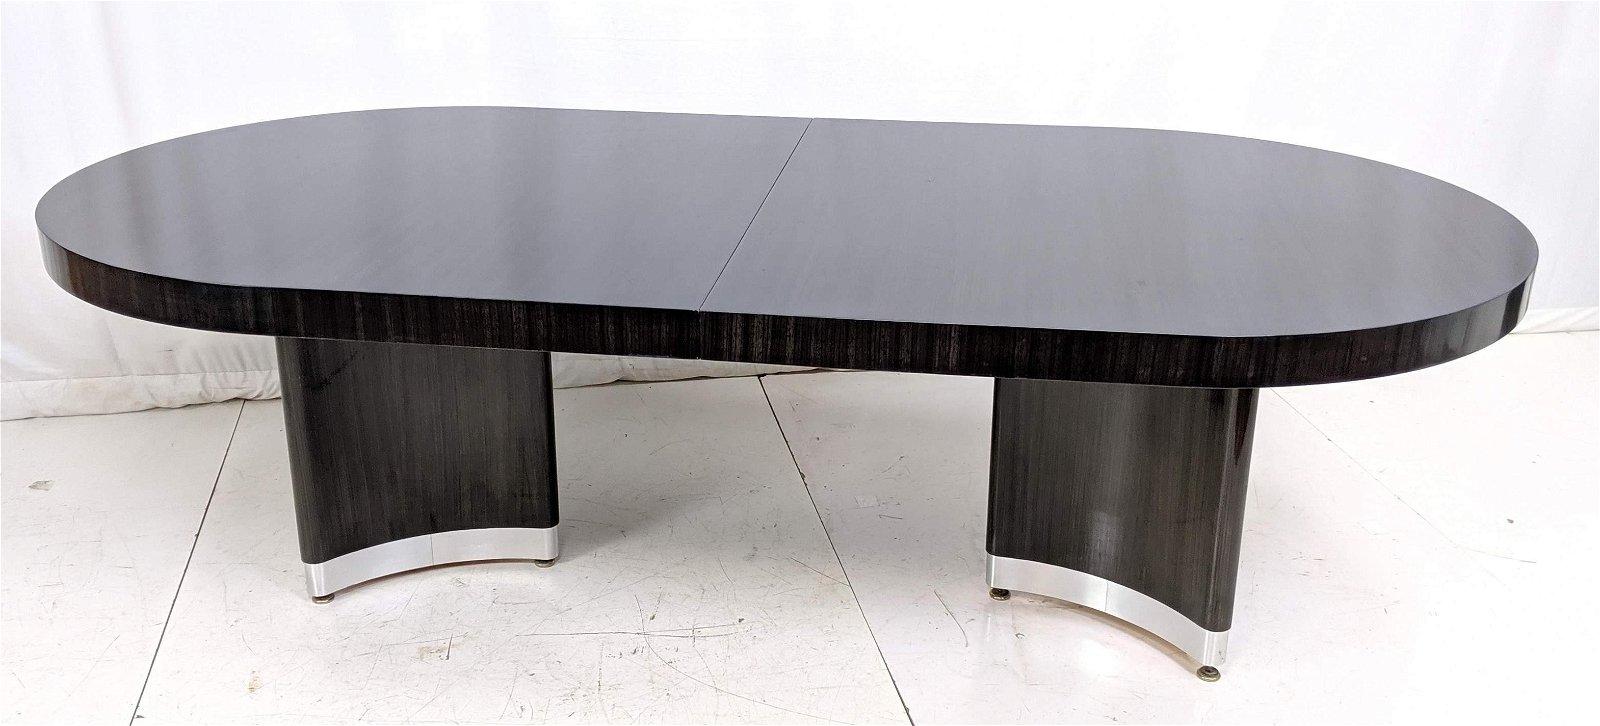 Decorator French Polish Wood Aluminum Dining Table. ERN